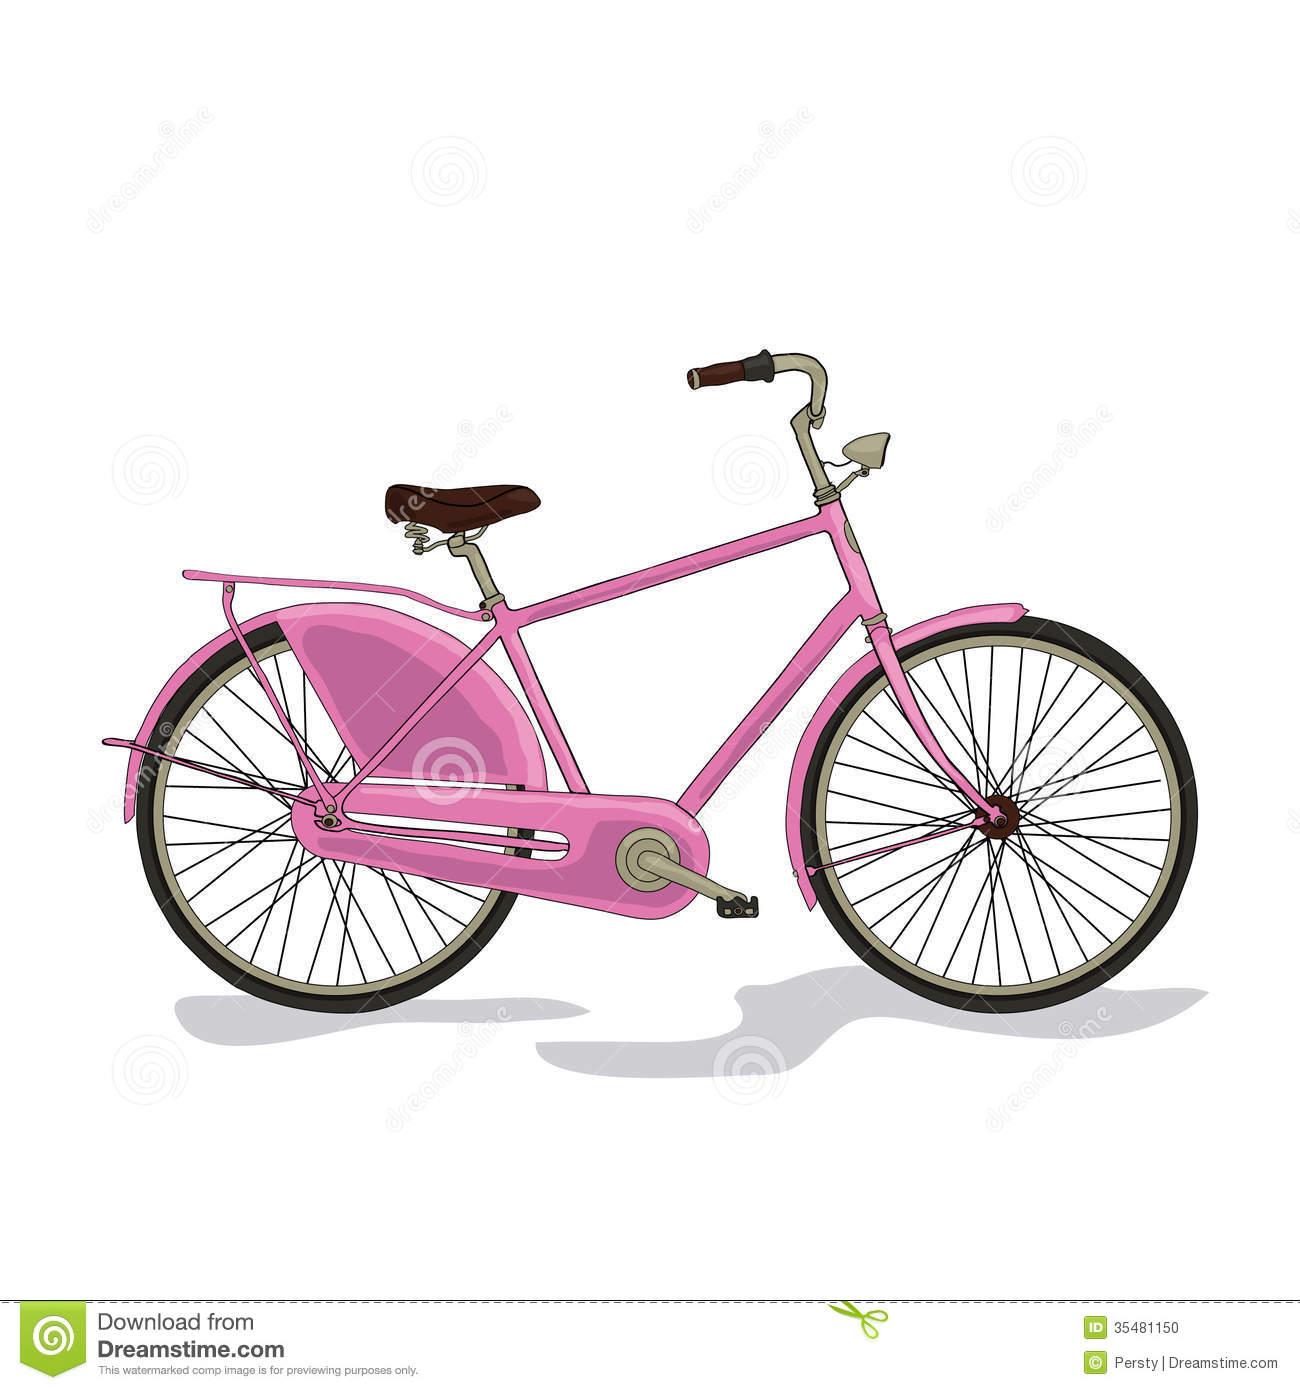 City bike clipart #4